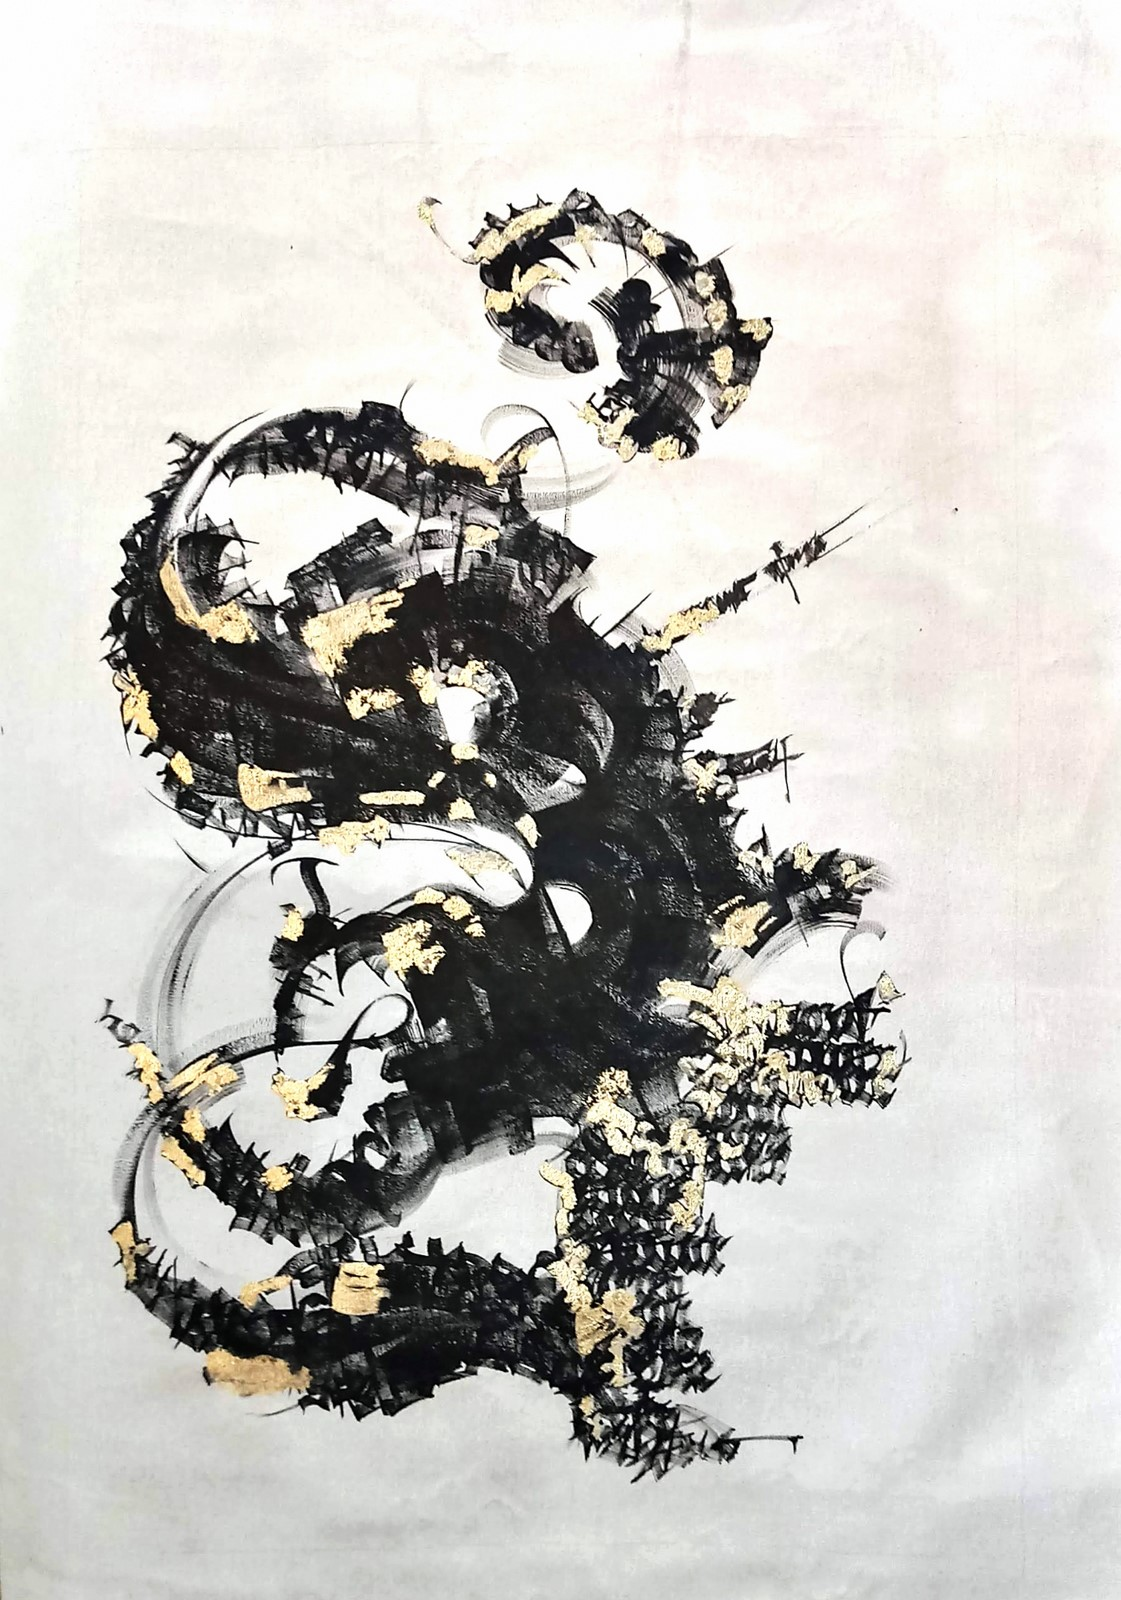 "<p>""Bruta Alfabe Bloğu: Santa Cruz de la Sierr""a, Bolivya, Tuval üzerine yağlıboya, 200 cm x 240 cm, 2018.<br /><em>""Bruta Alphabet Block"", Painted in Santa Cruz de la Sierra, Bolivia, Oil on canvas, Dimensions: 200 x 240 cm, 2018.</em></p><p></p>"